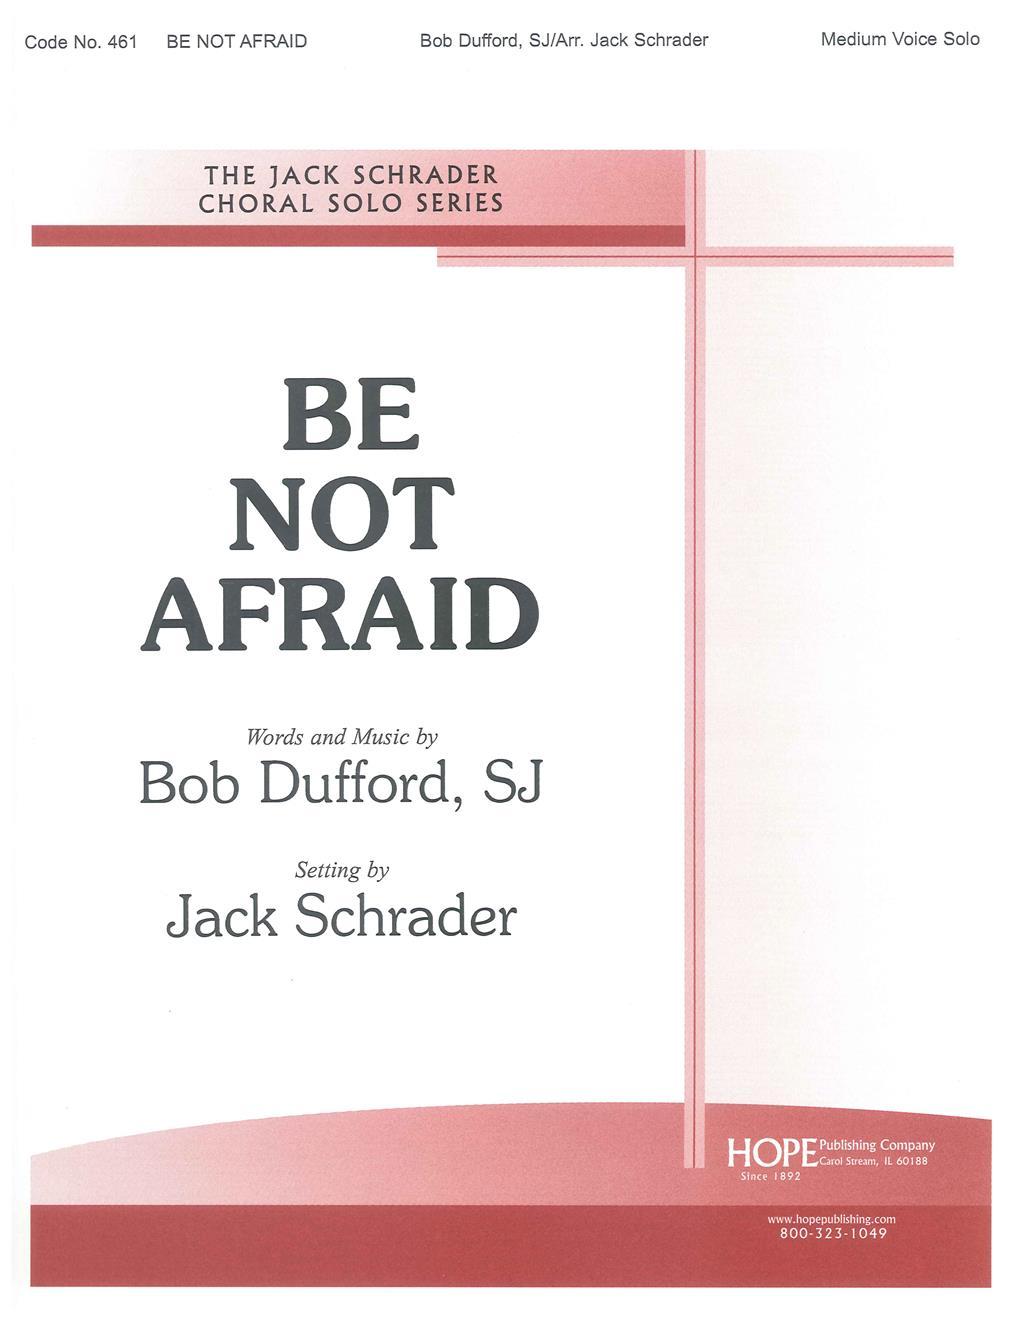 BE NOT AFRAID-JS-SOLO - Hope Publishing Company